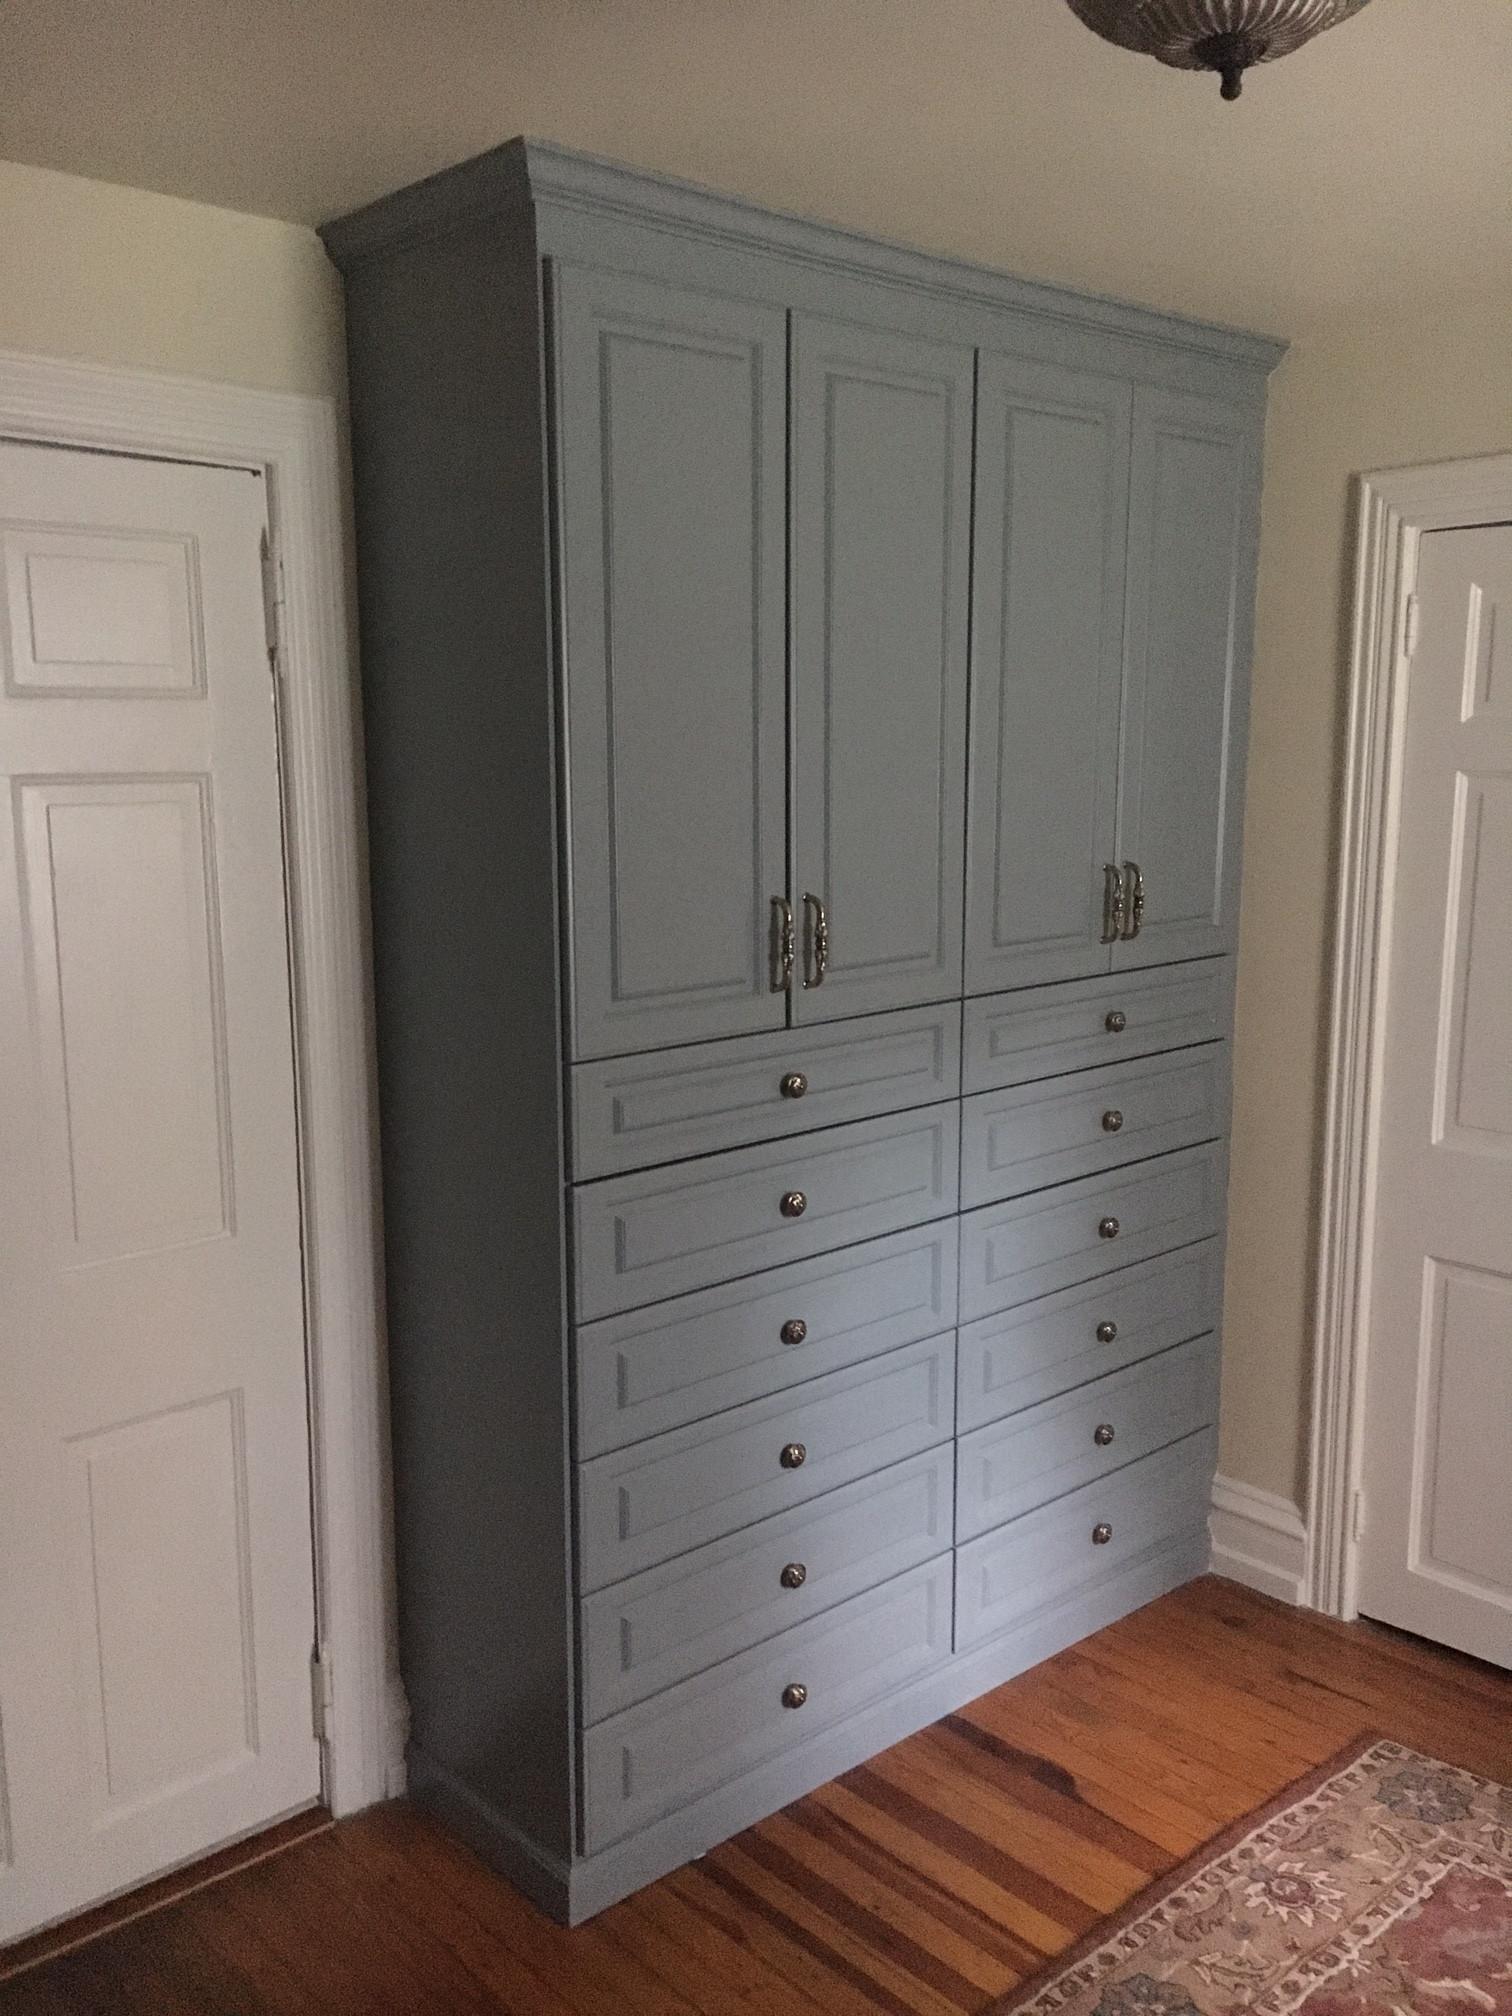 Painted Wardrobe units